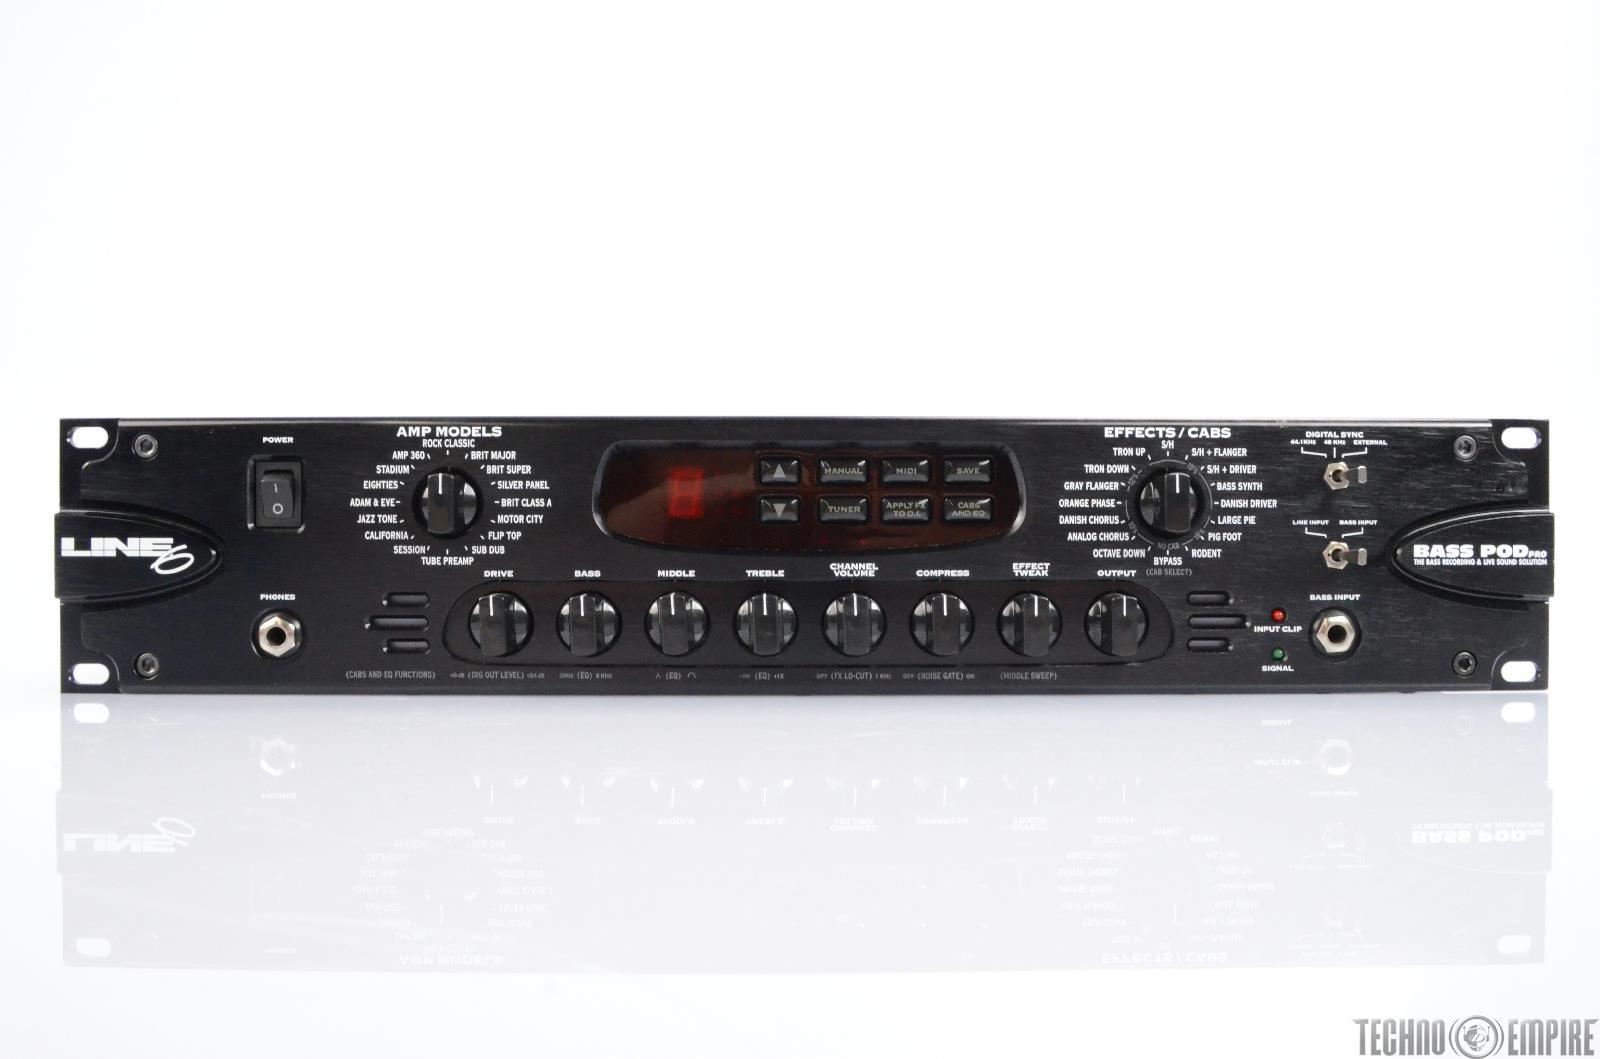 line 6 bass pod pro amp simulator effects processor rack 25343 ebay. Black Bedroom Furniture Sets. Home Design Ideas